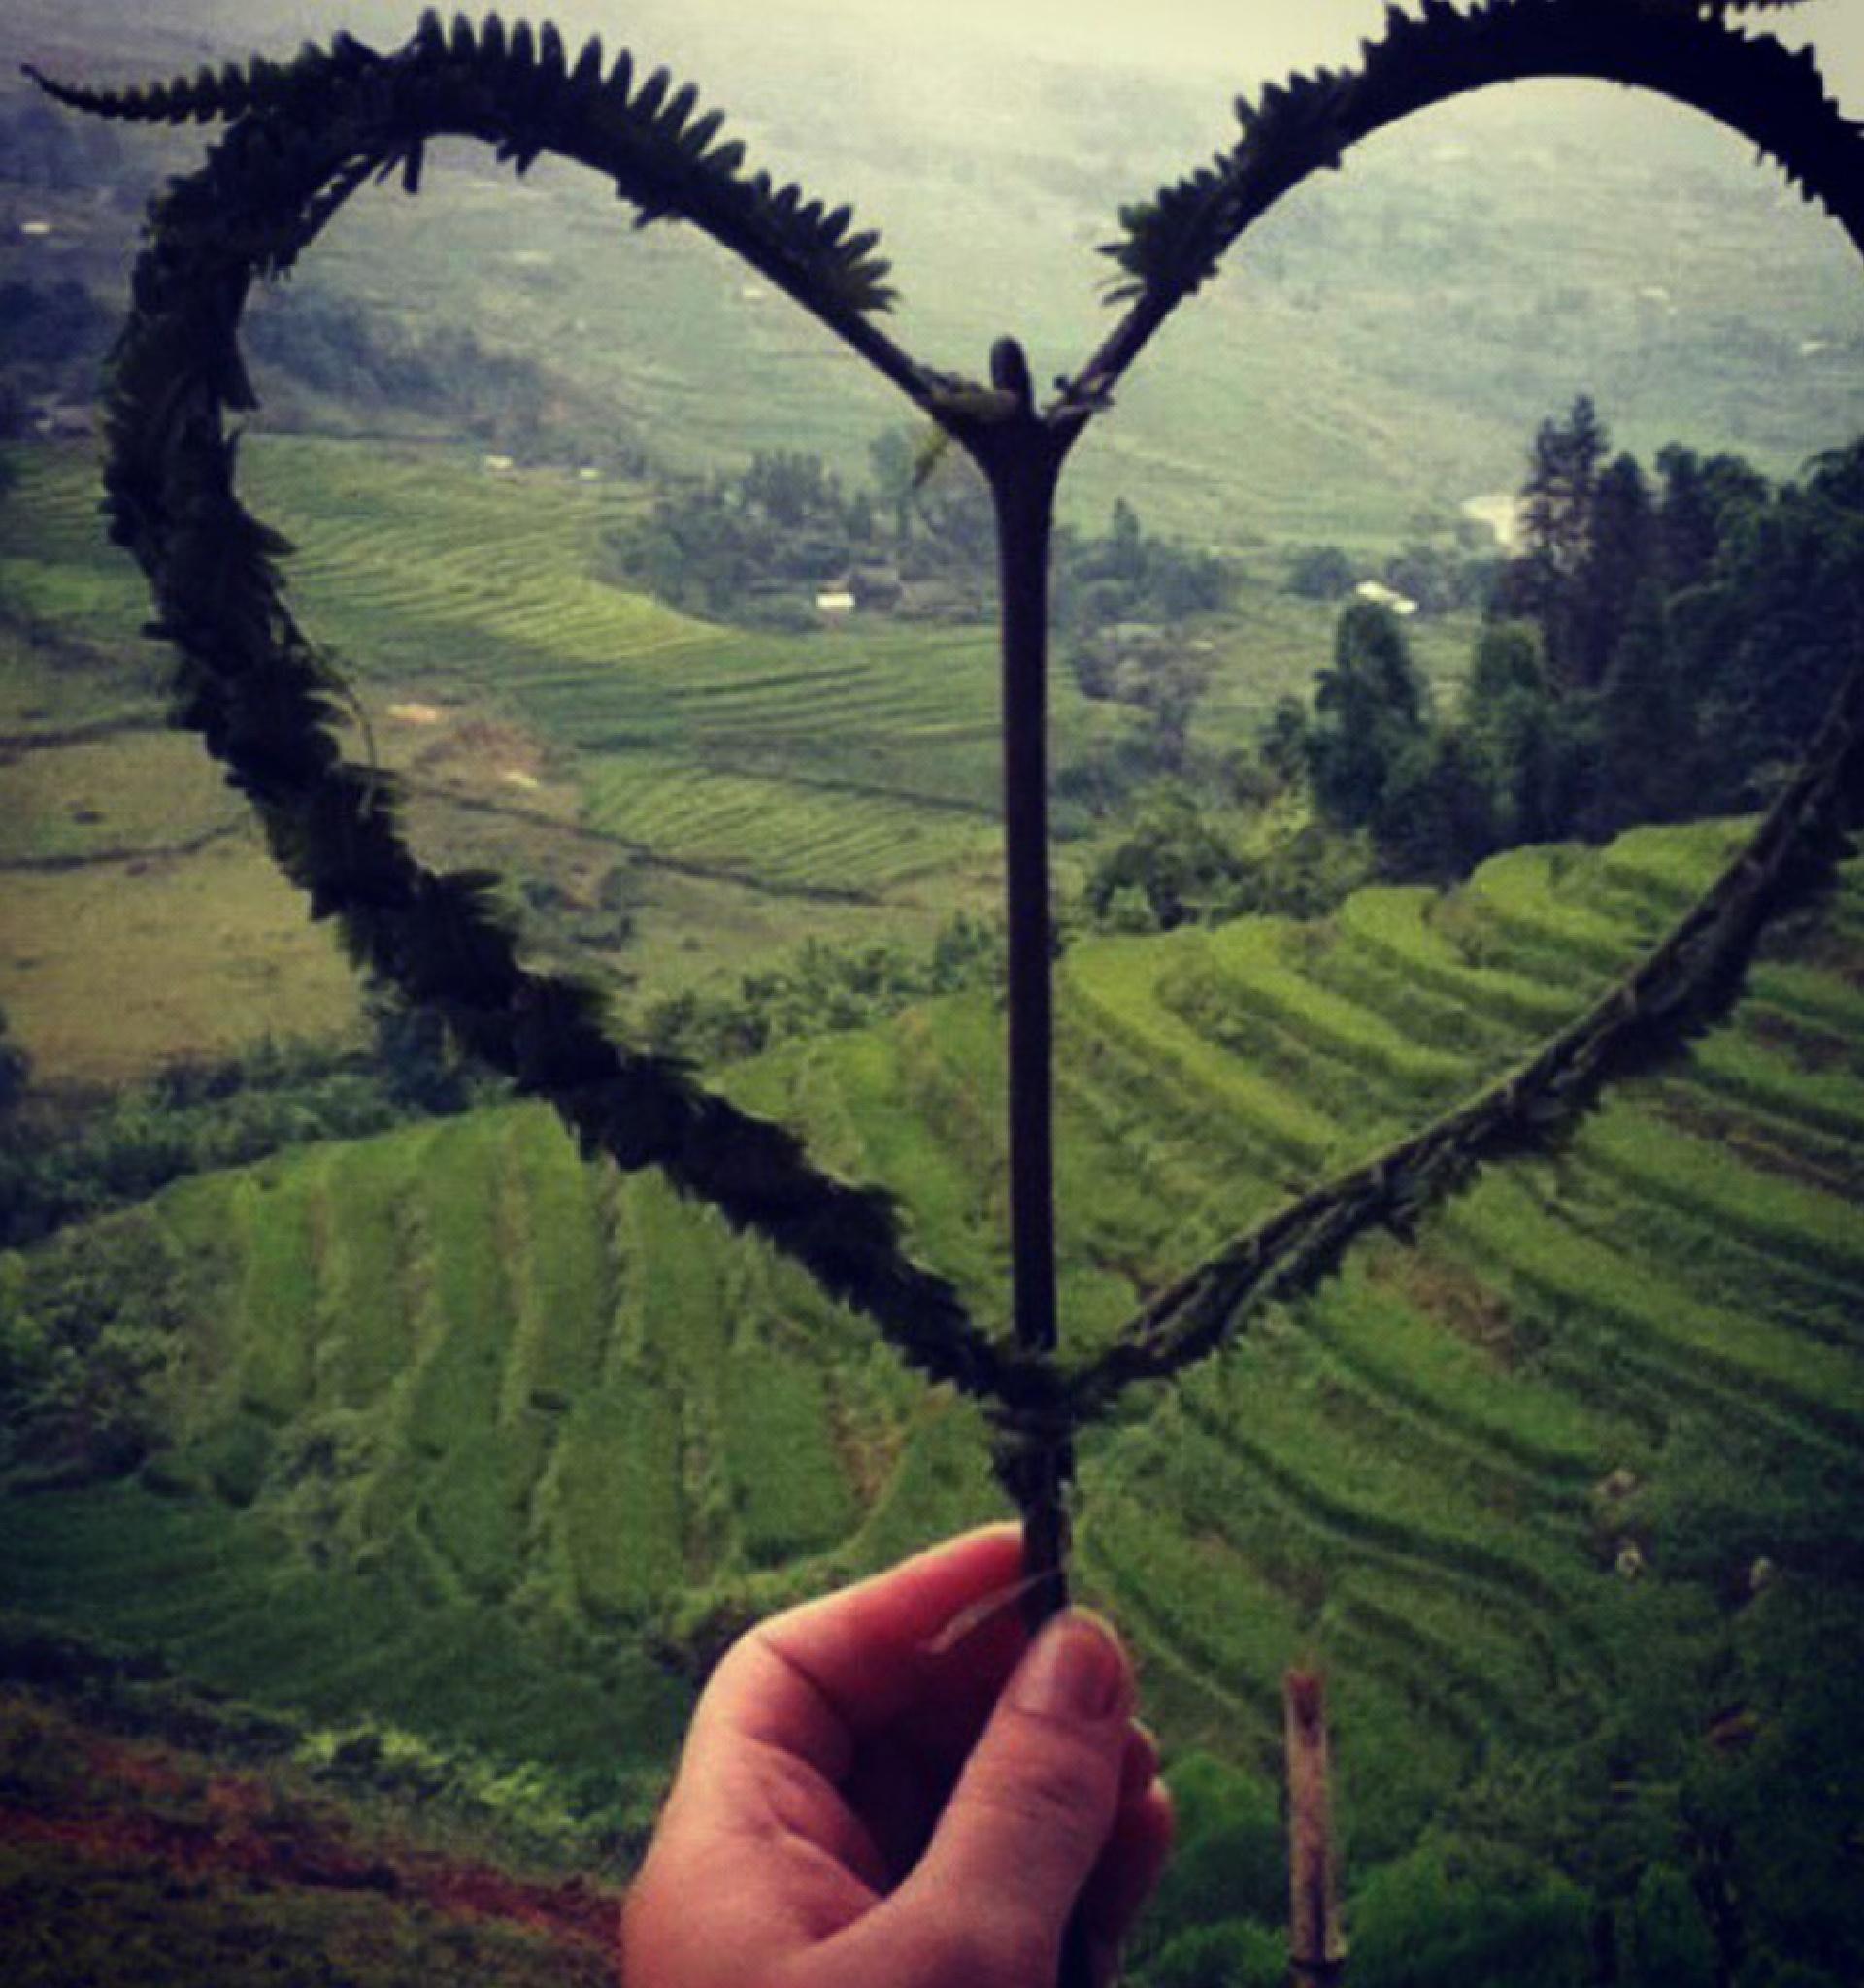 I Heart you Sapa by Hannah McDonagh